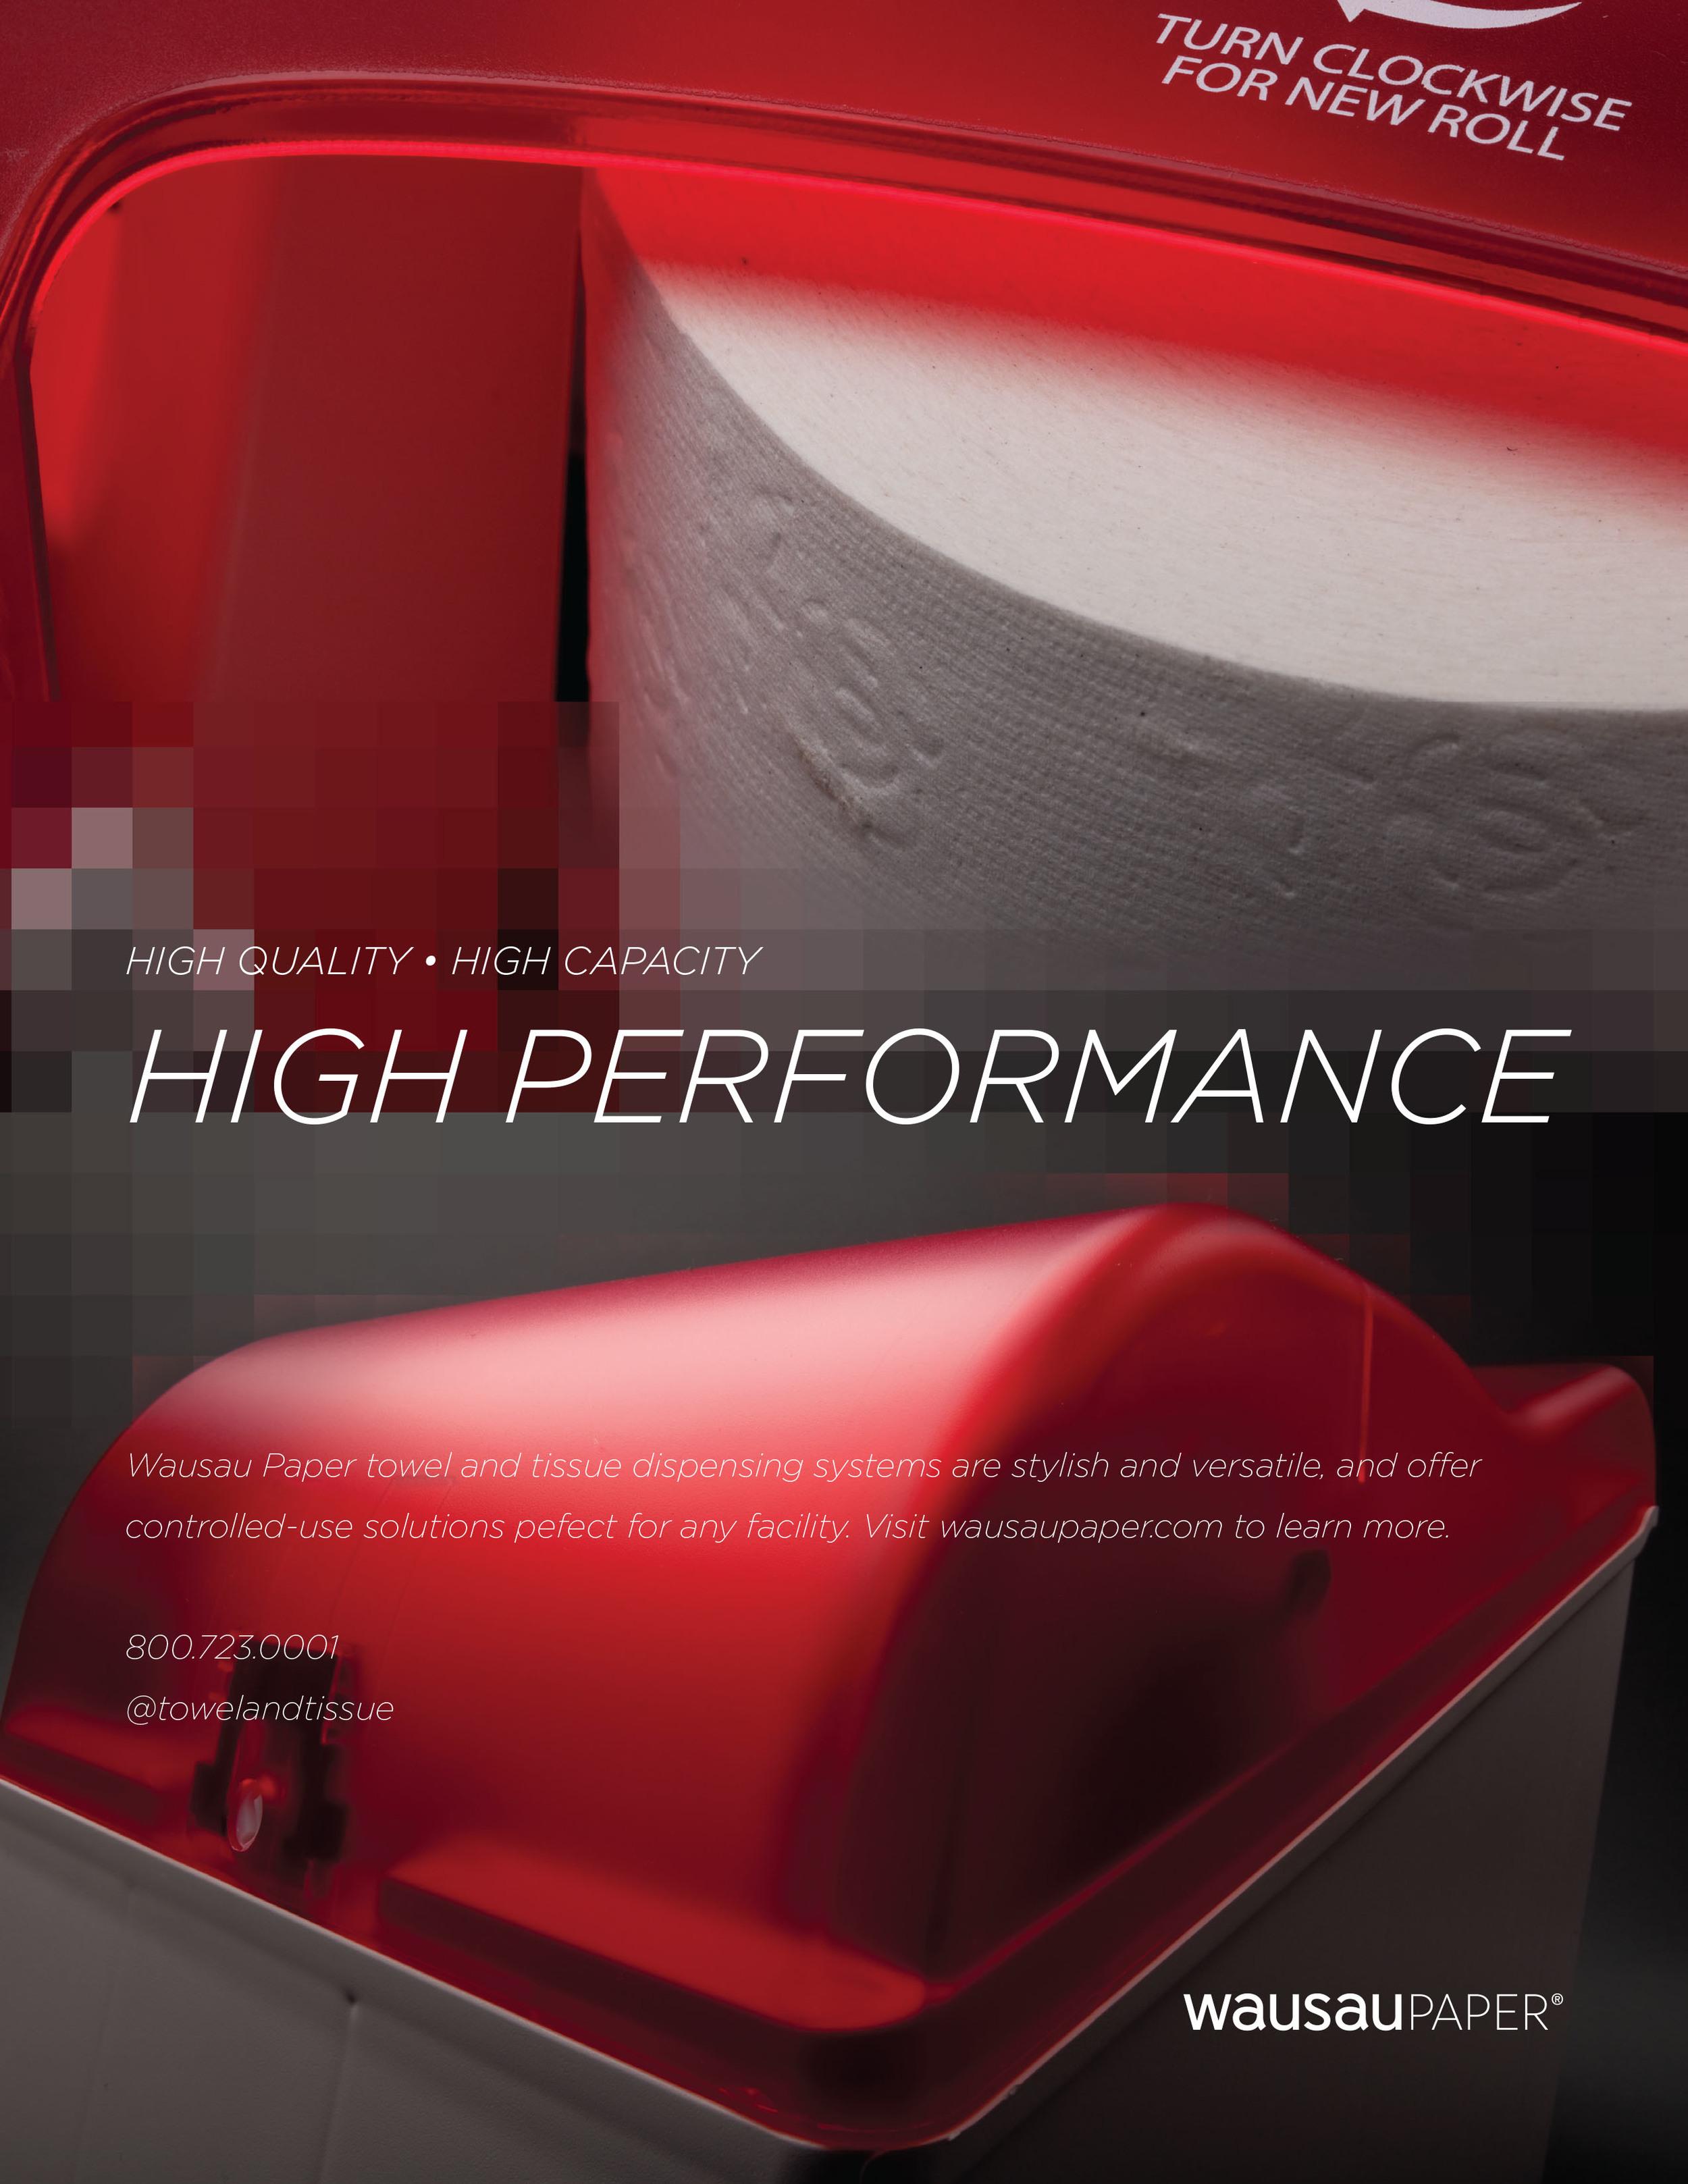 2012 Ad Concepts-8.jpg